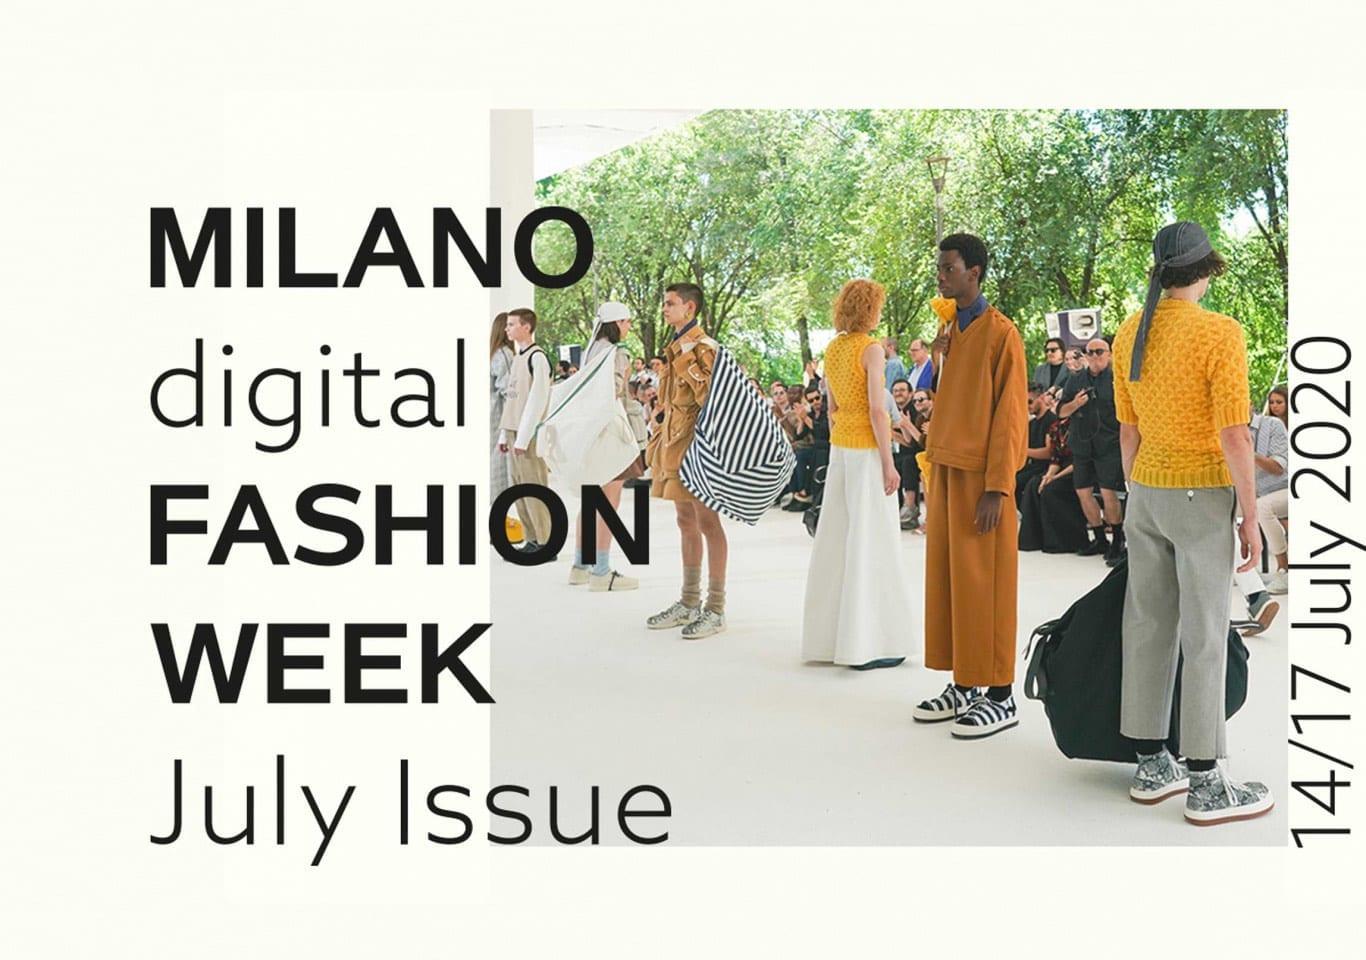 Неделя моды в Милане пройдет в июле в онлайн формате